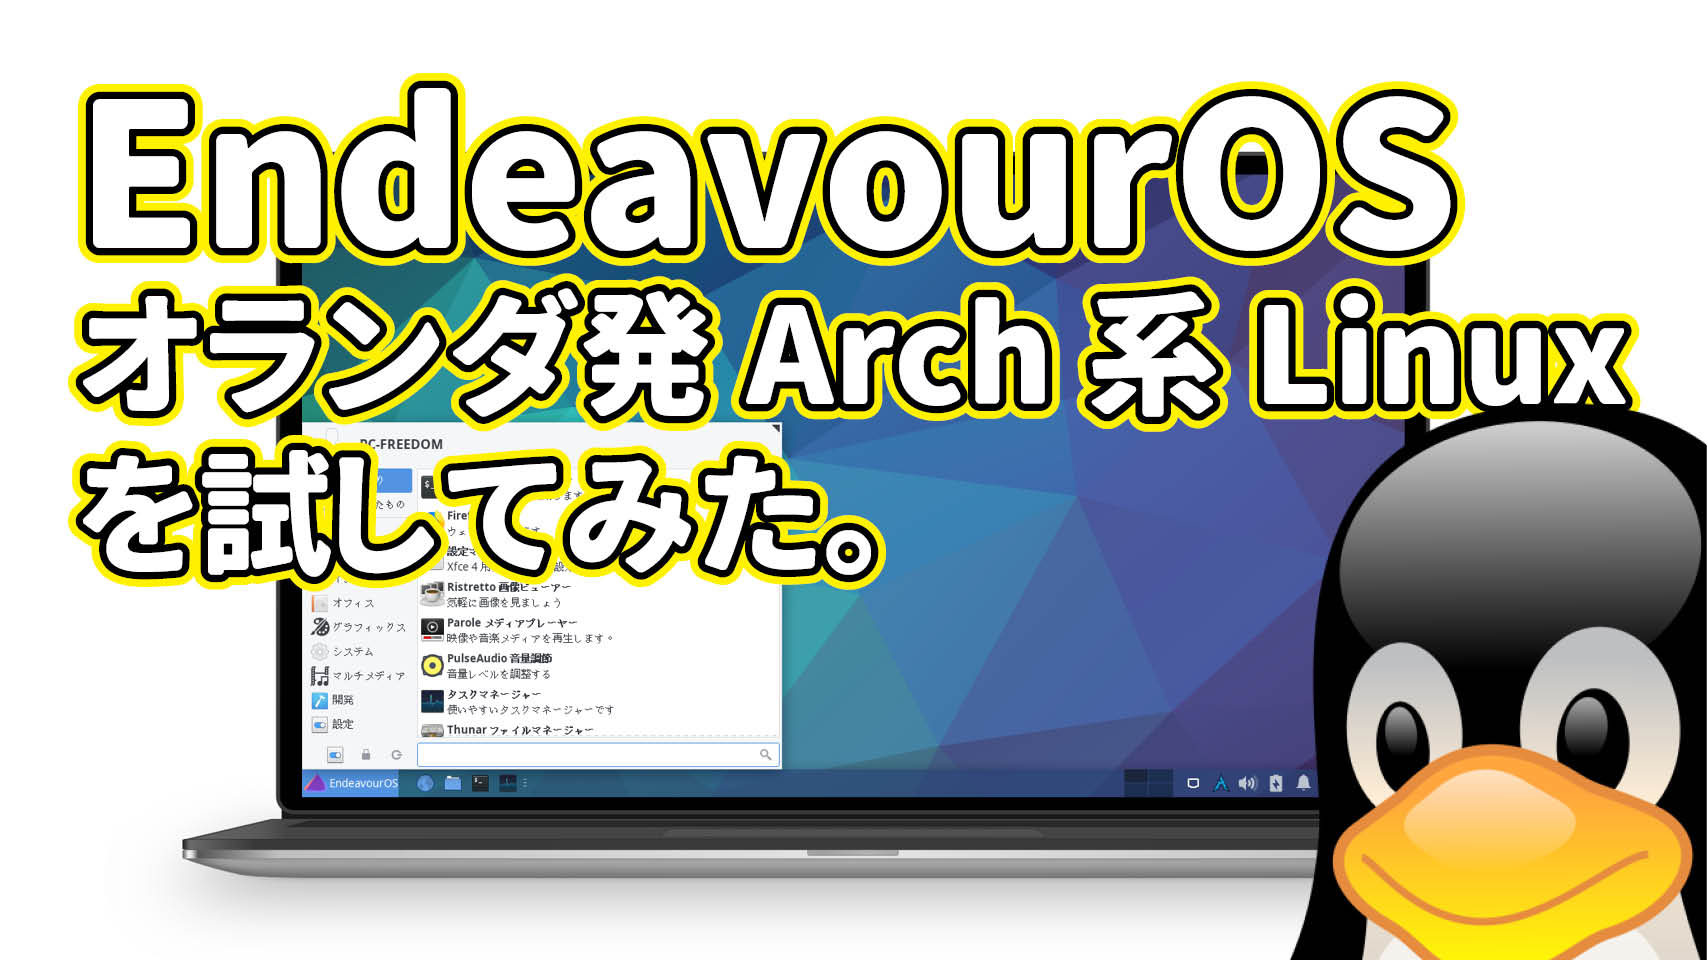 EndeavourOS: オランダ発Arch系Linuxを試してみた。